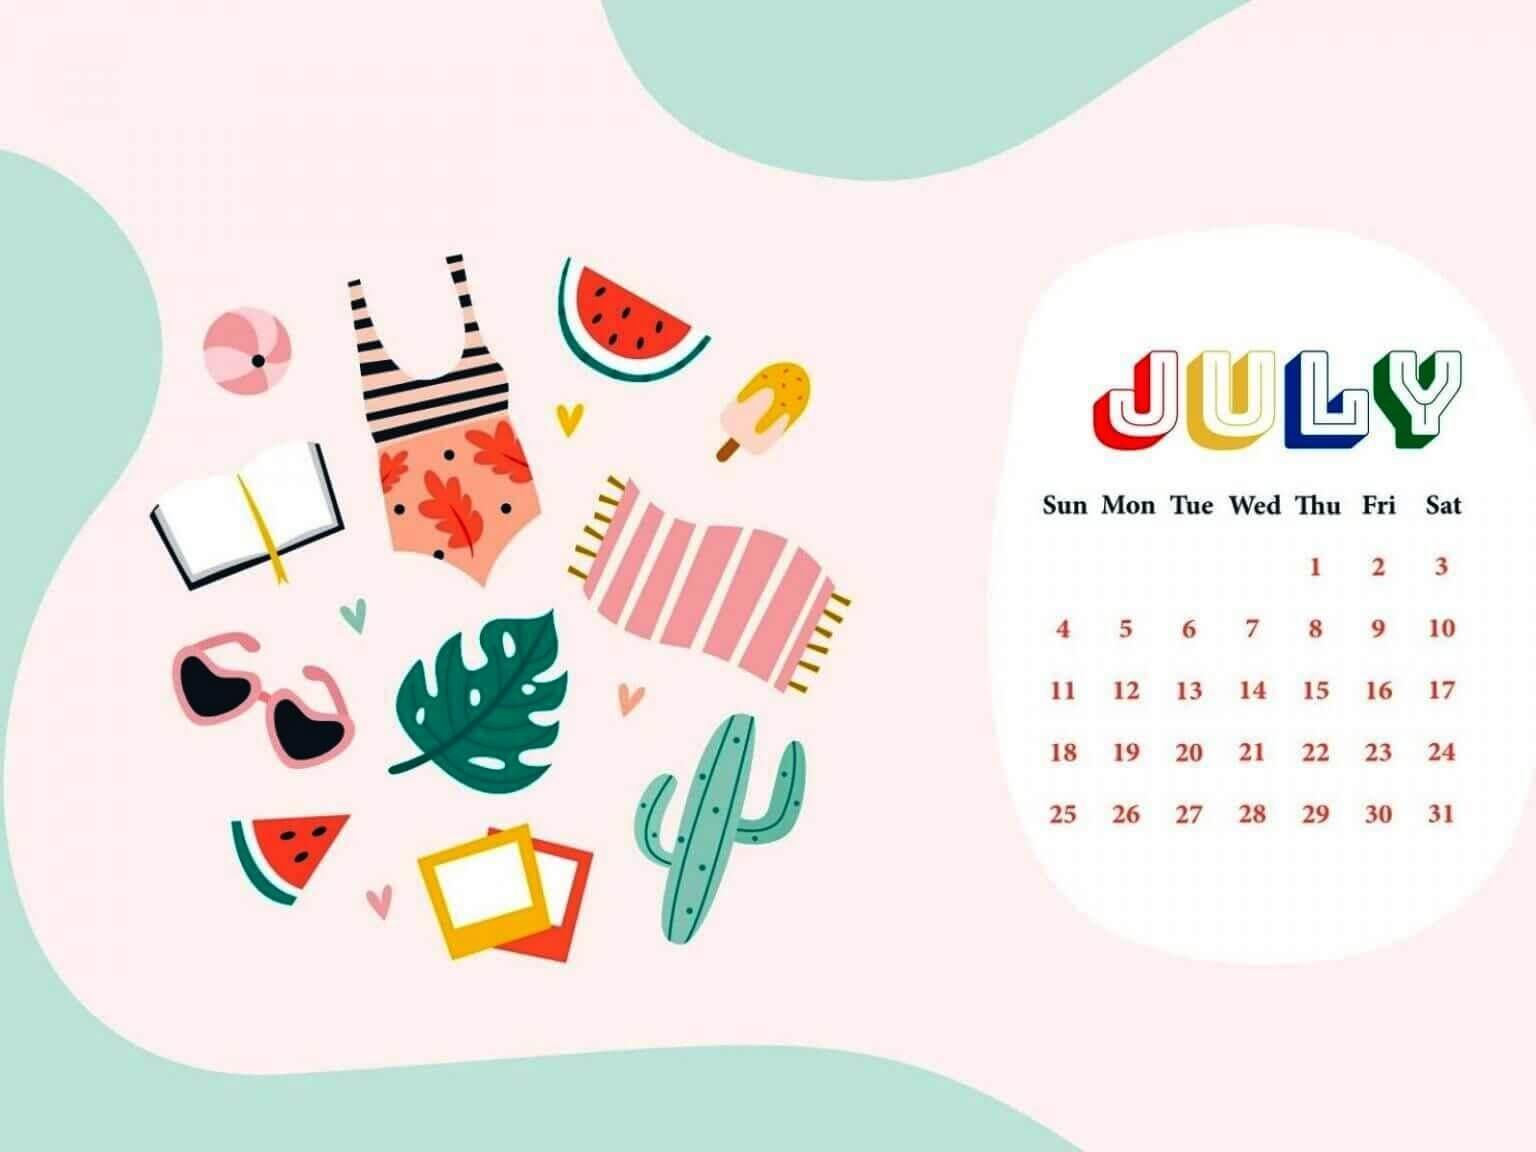 July 2021 Wall Calendar